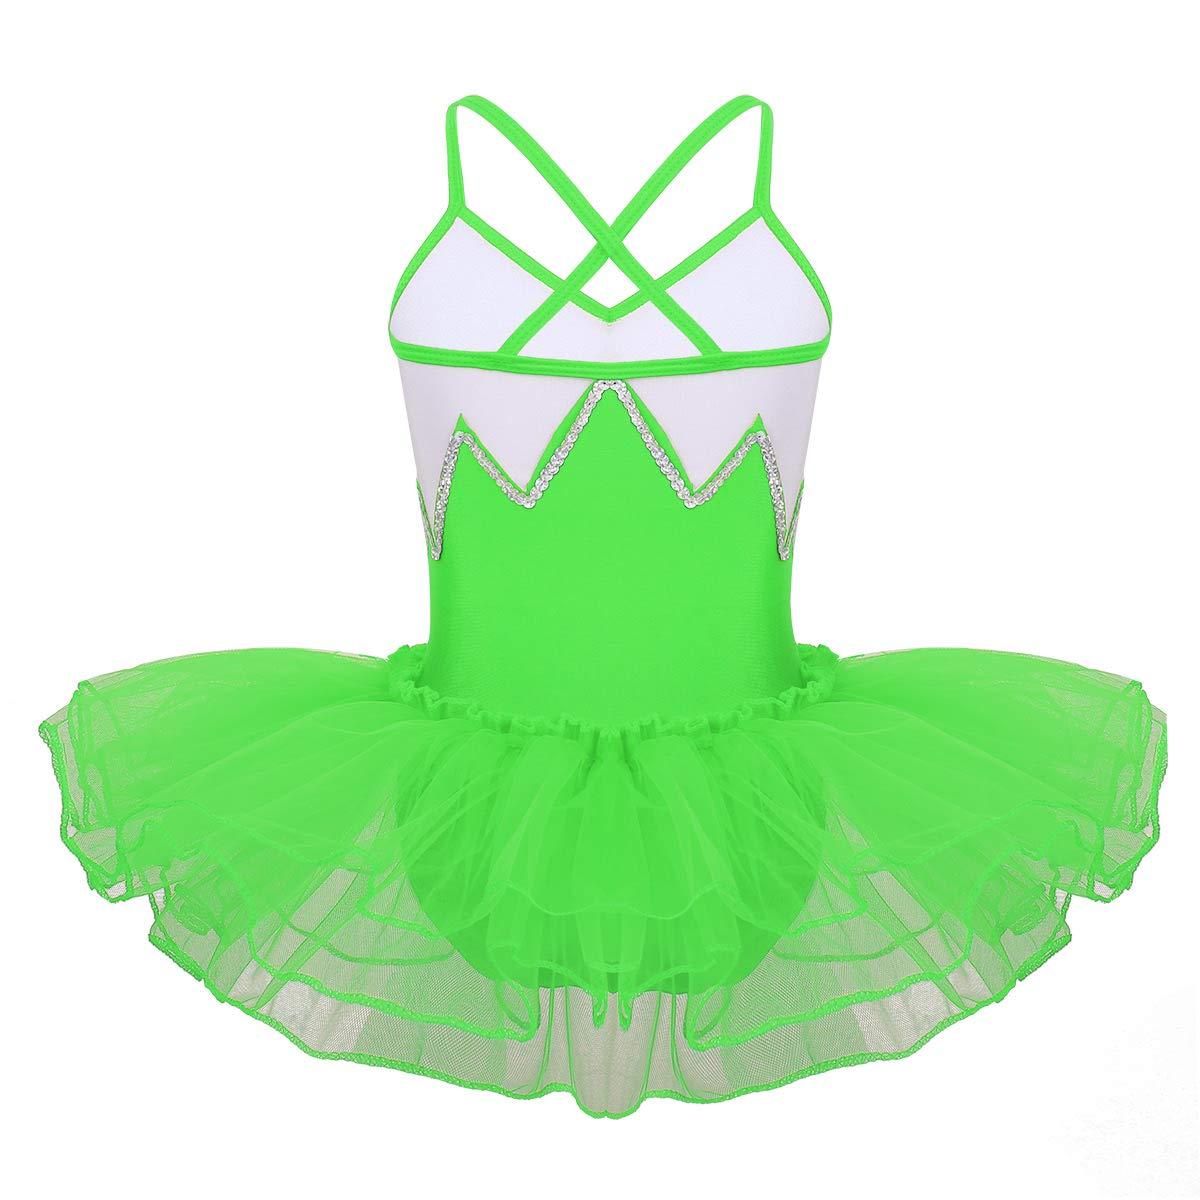 CHICTRY Kids Girls Basic Camisole Ballet Dress Tutu Chiffon Ruffled Gymnastics Leotard Skirt